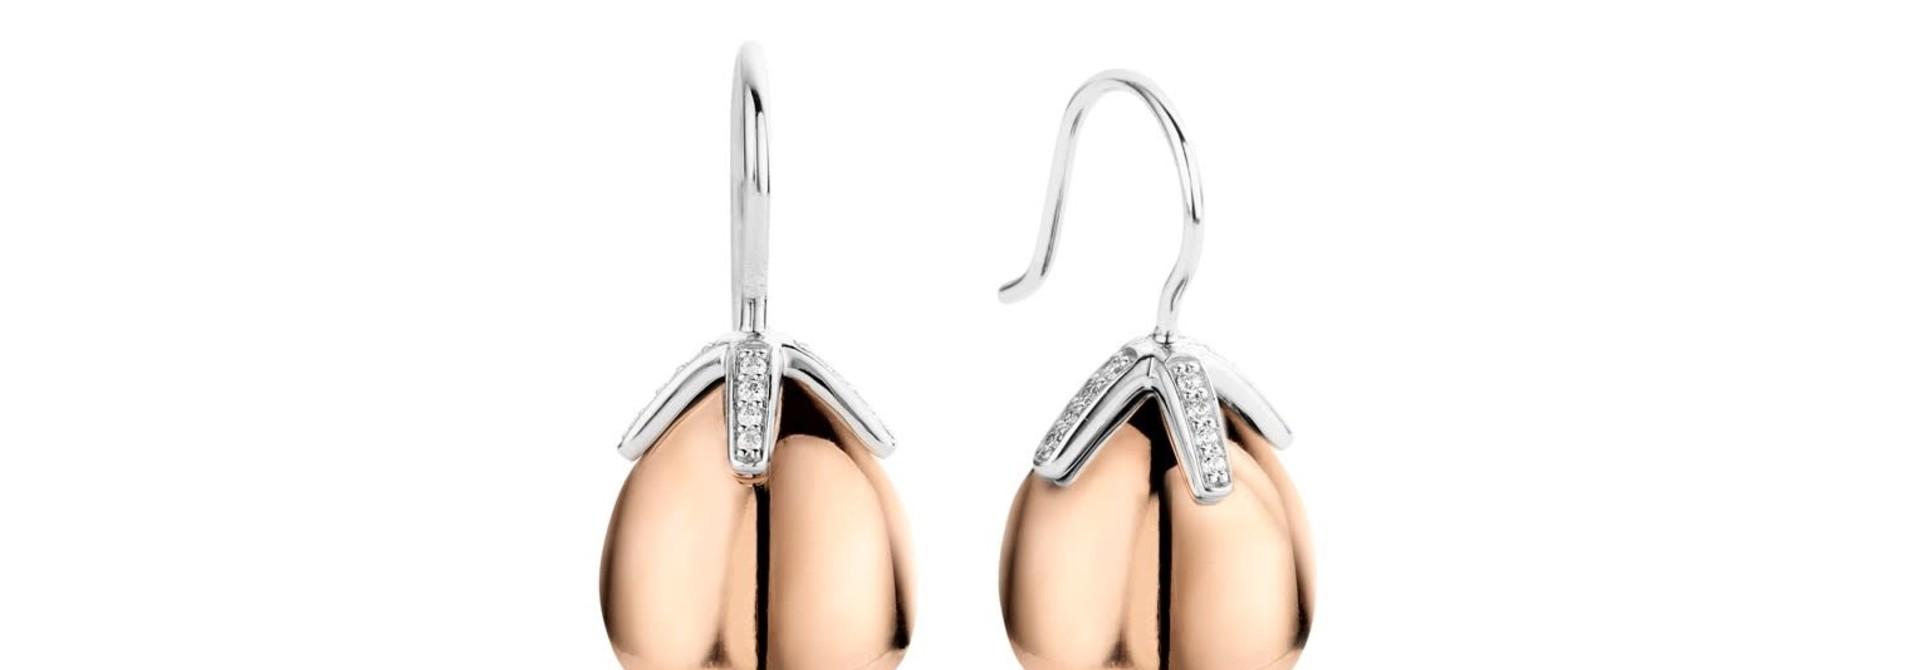 TI SENTO - Milano Earrings 7775SR